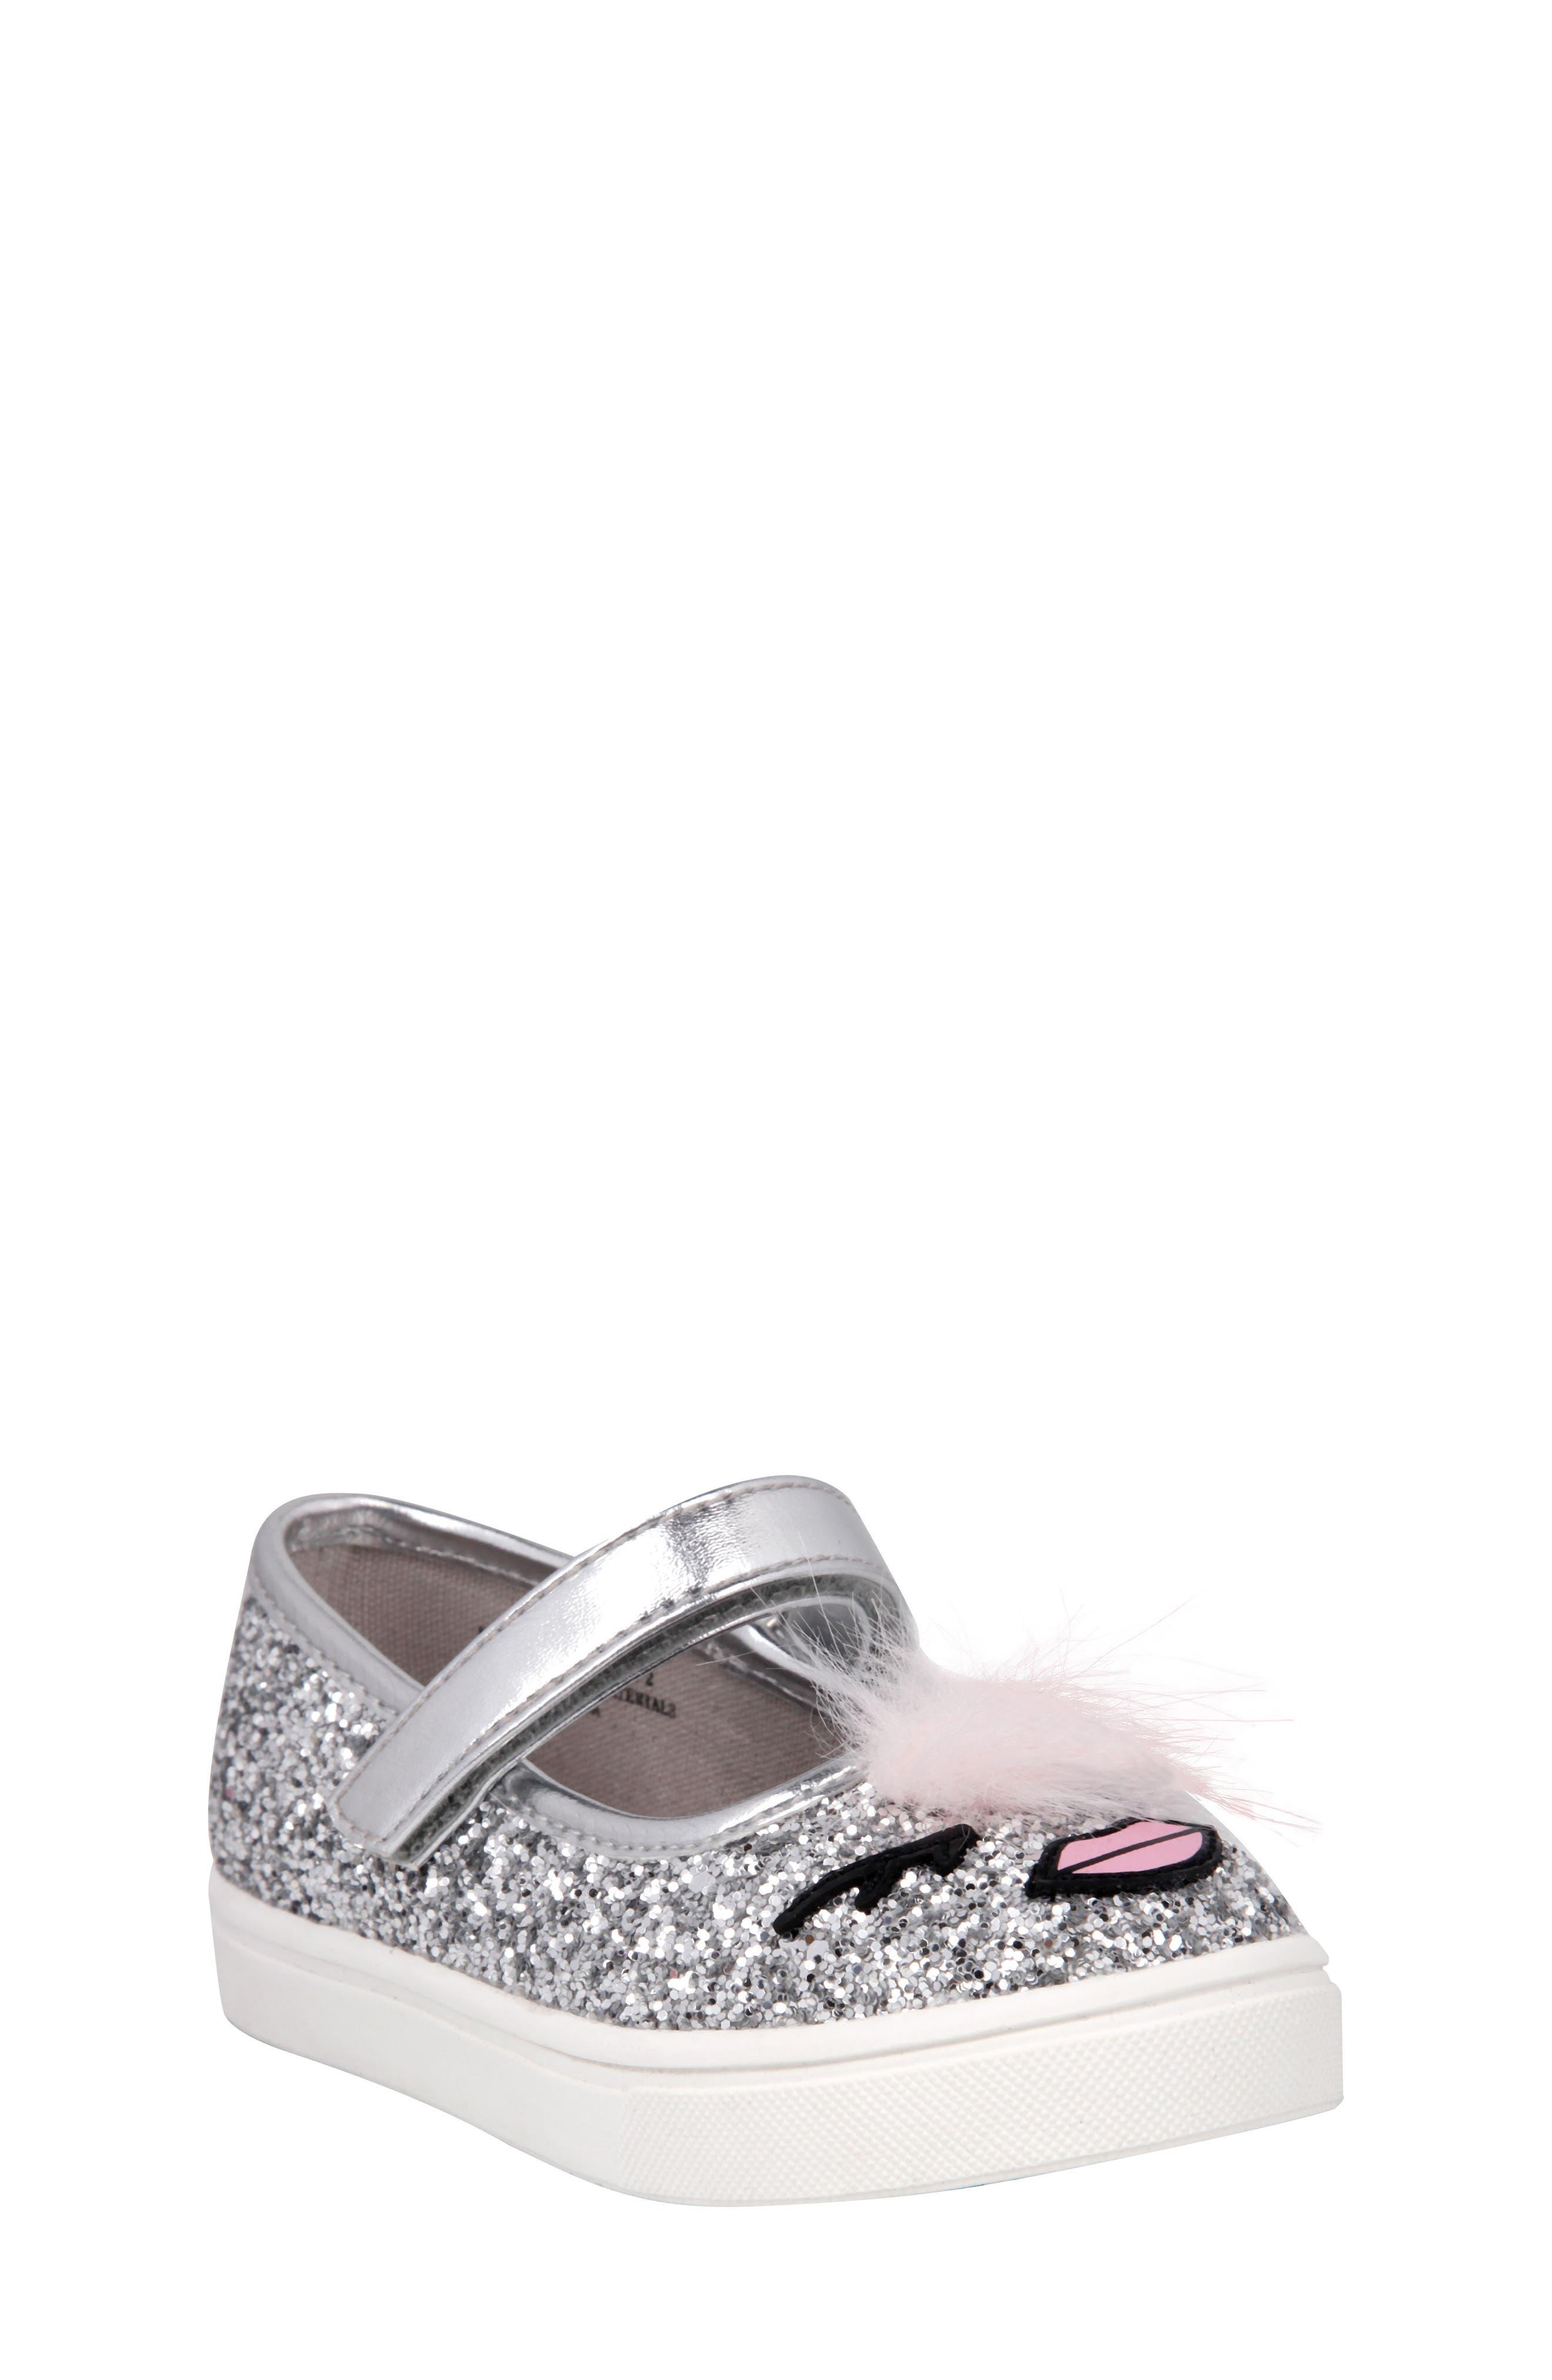 Ragina Faux Fur Glitter Mary Jane Sneaker,                         Main,                         color, Silver Chunky Glitter